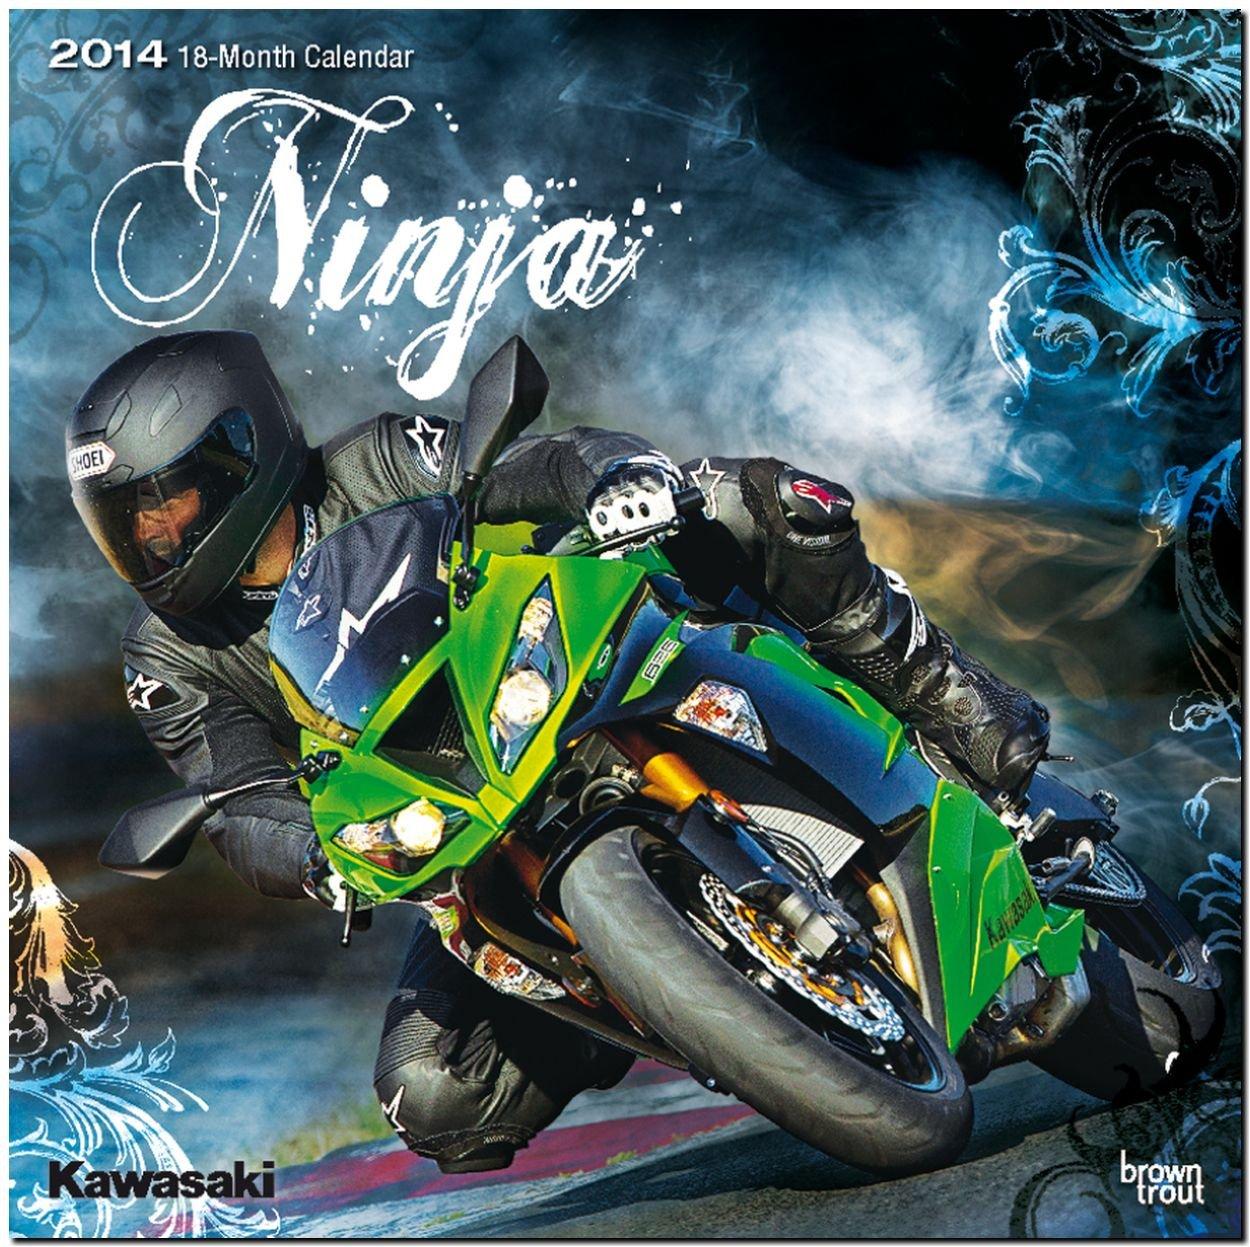 Kawasaki 2014: Original BrownTrout-Kalender [Mehrsprachig] [Kalender]